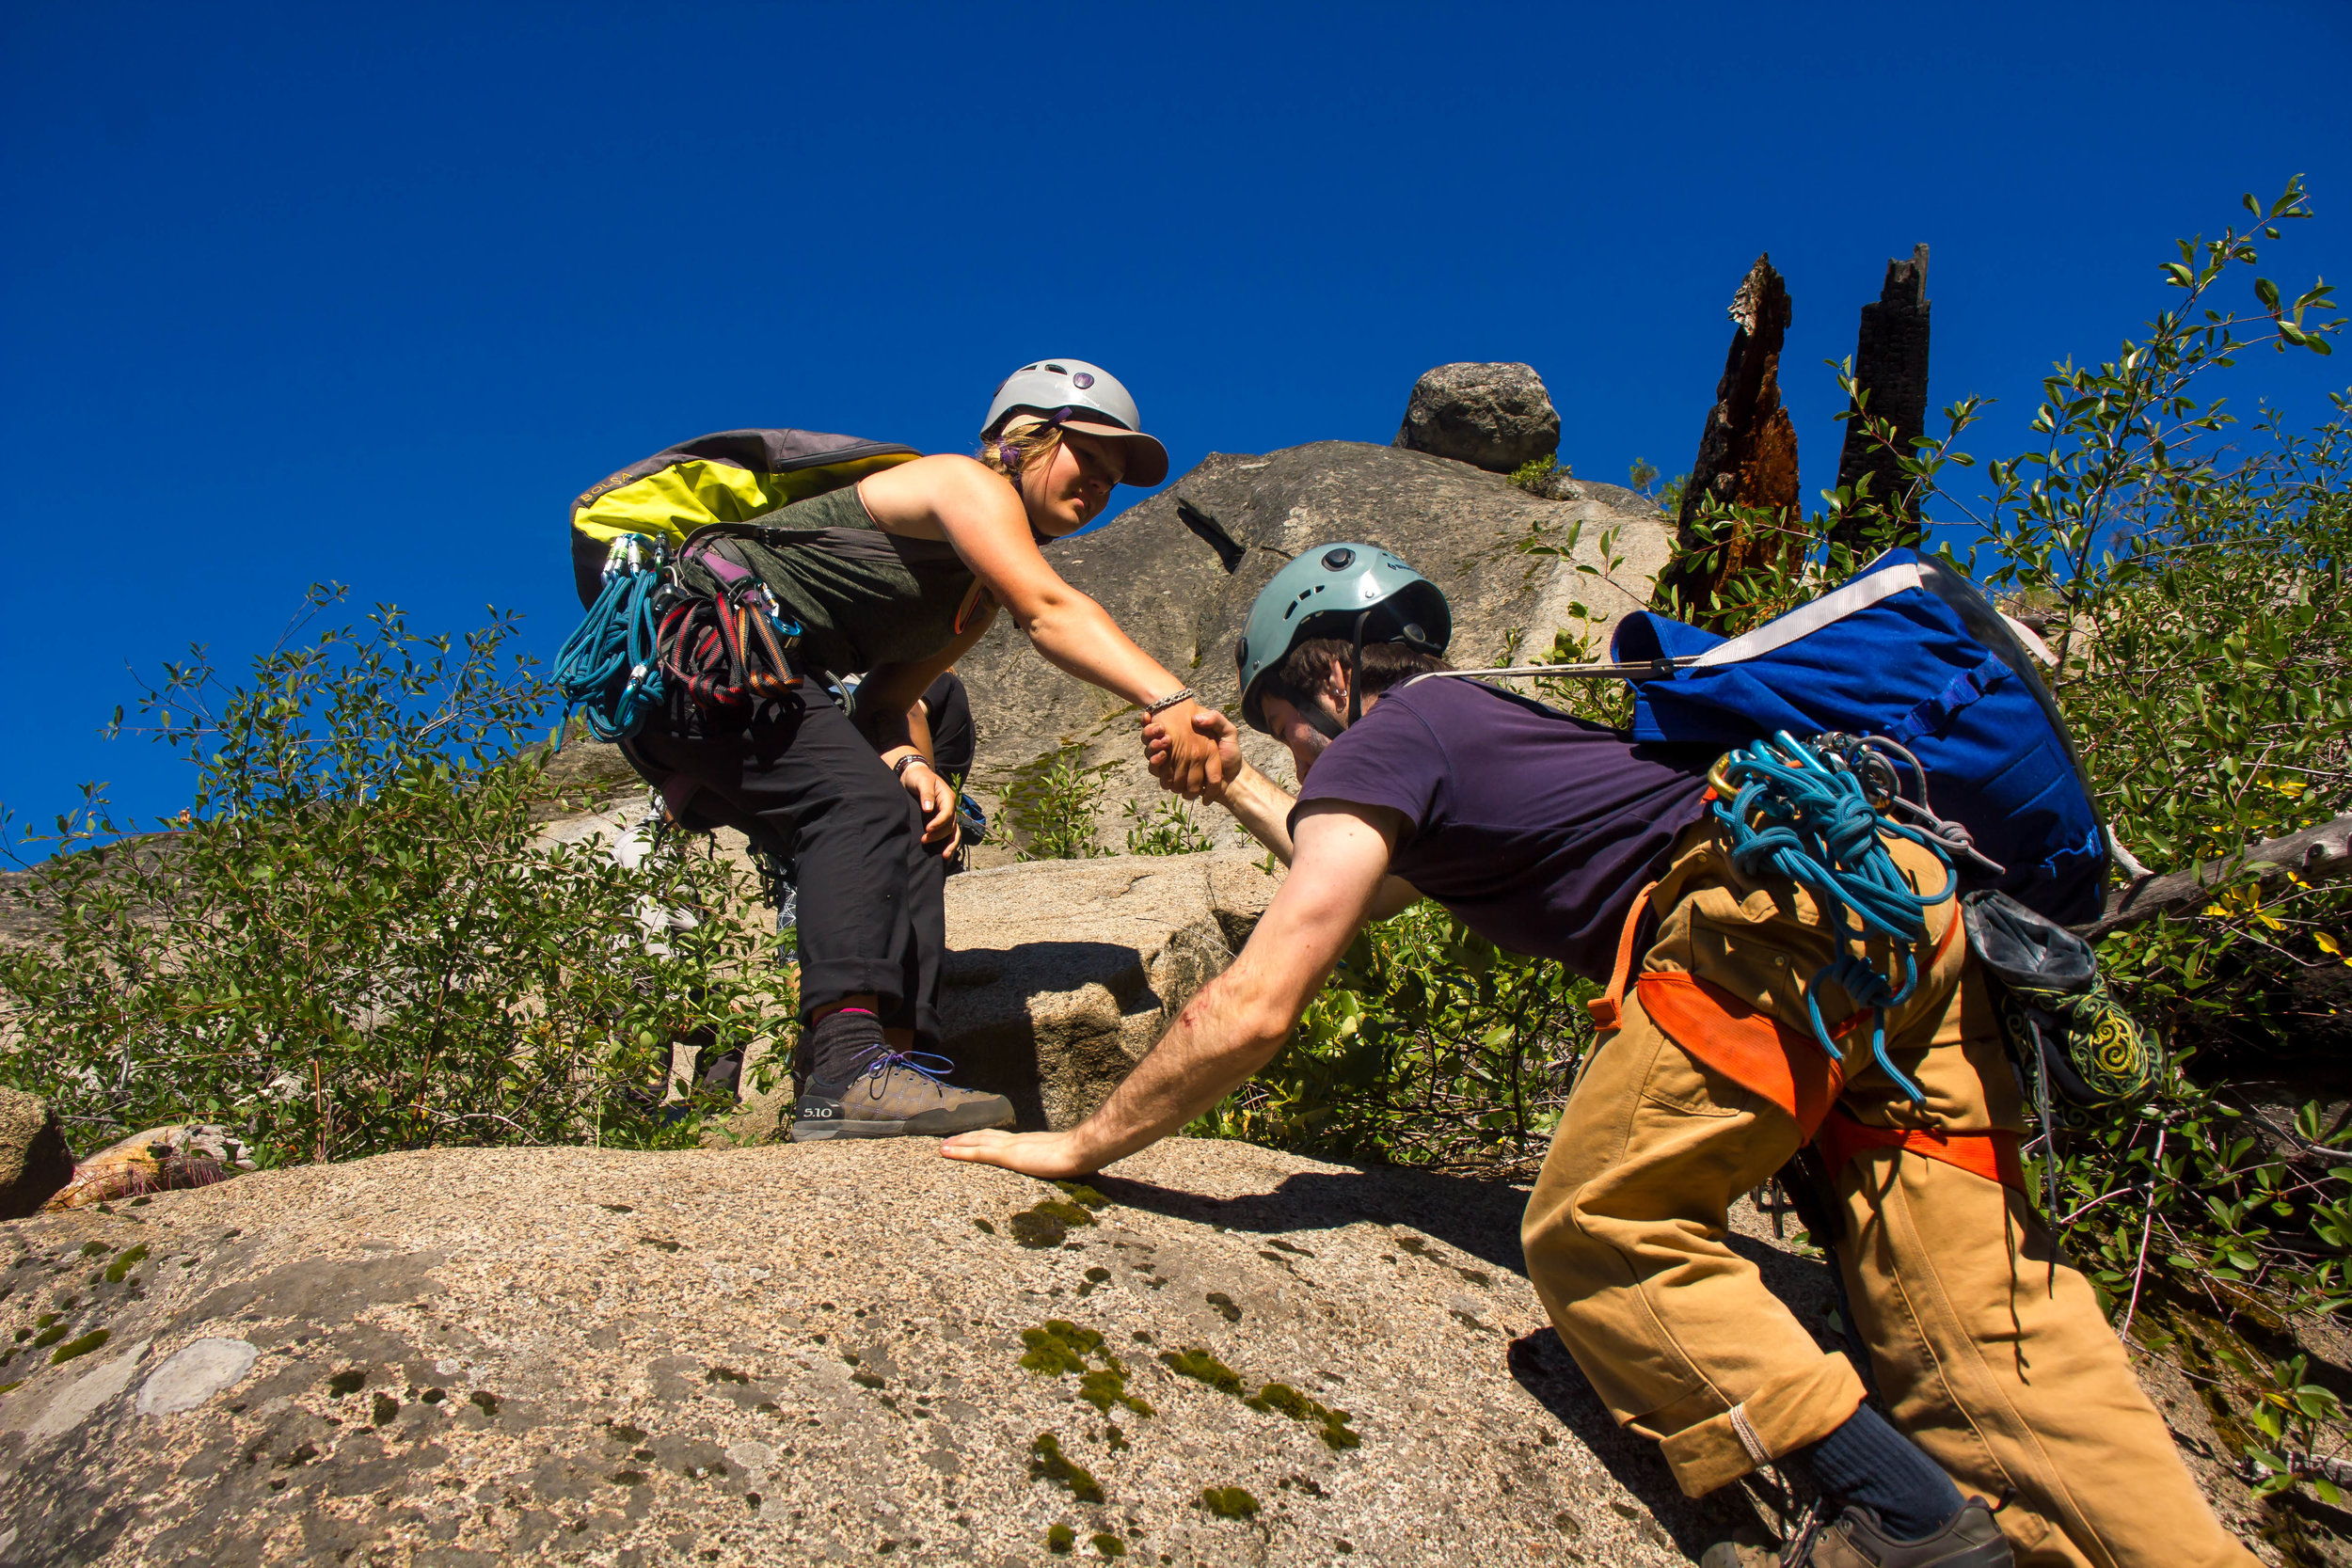 - The Cascade Leadership Challenge Venture Crew is run 100% by volunteers.